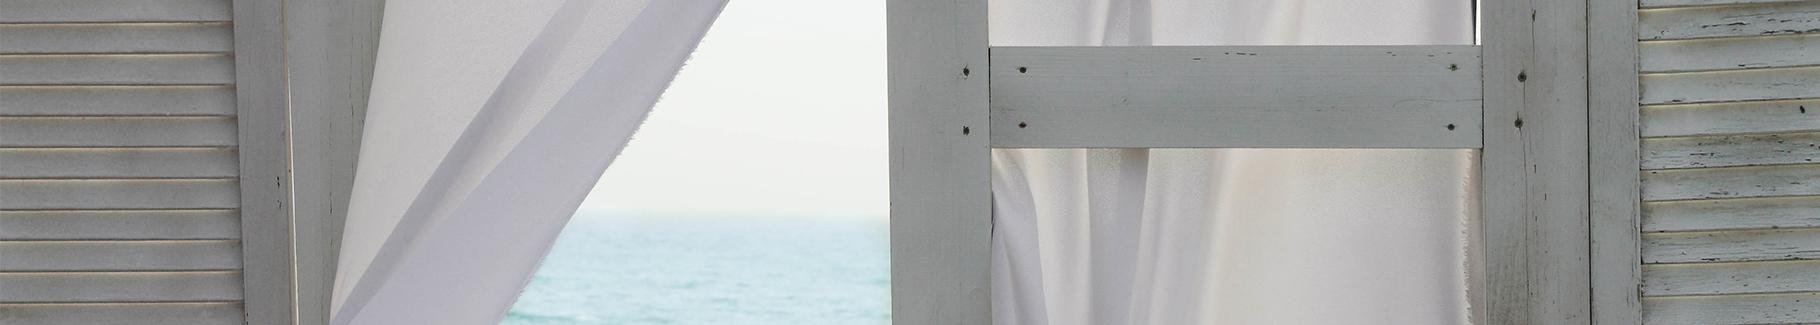 Fototapeta okno na ocean